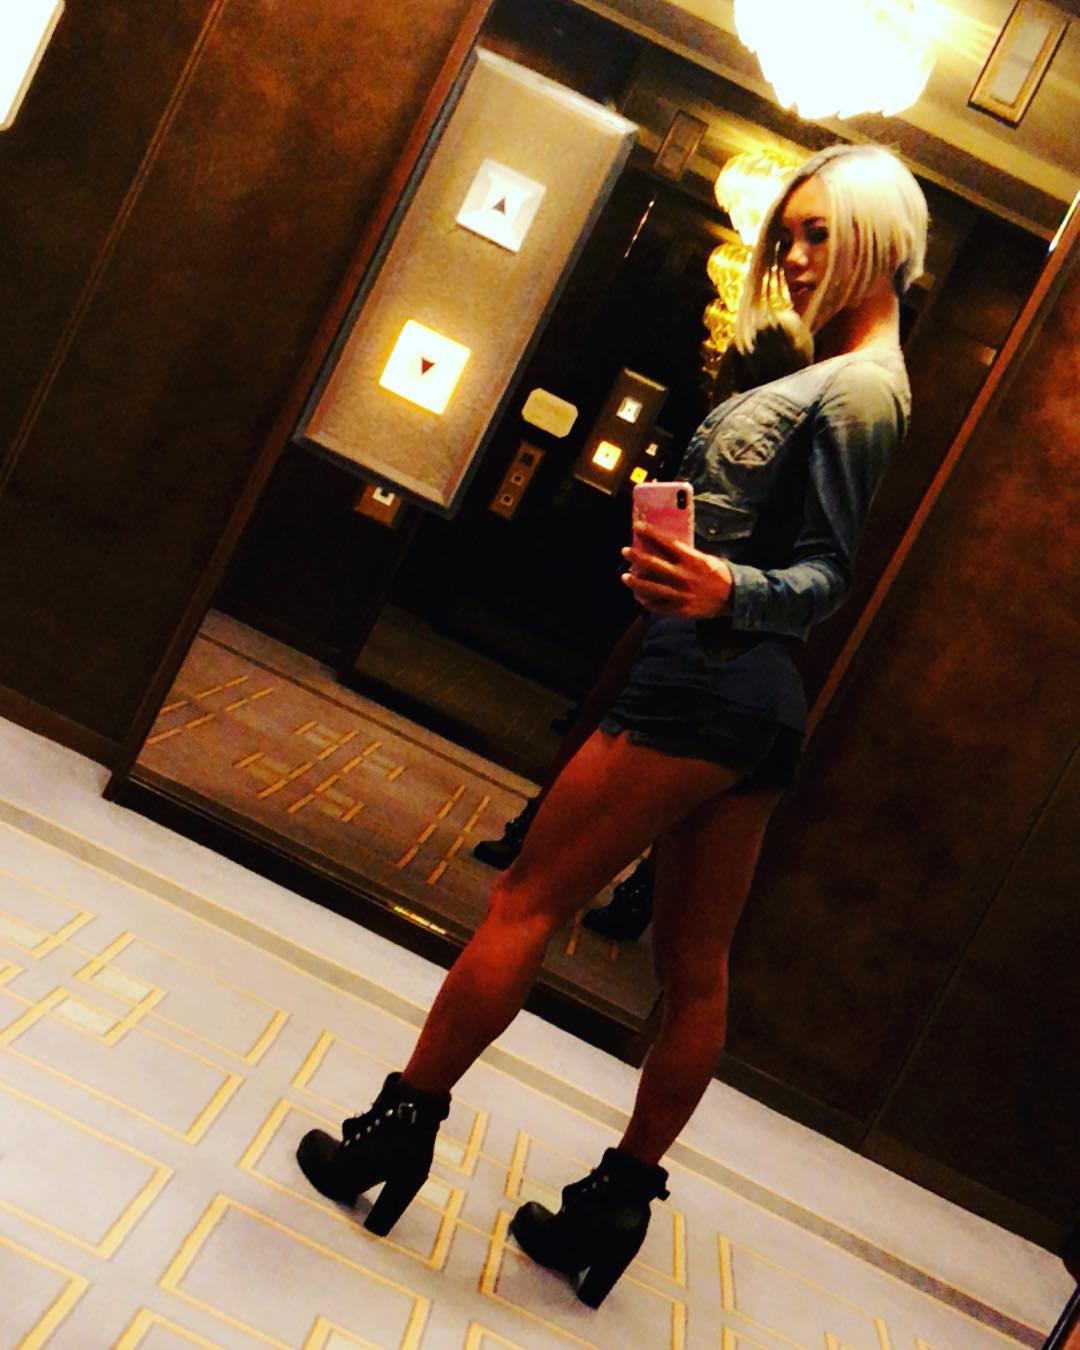 Ladyboy Miran elevator full body selfie